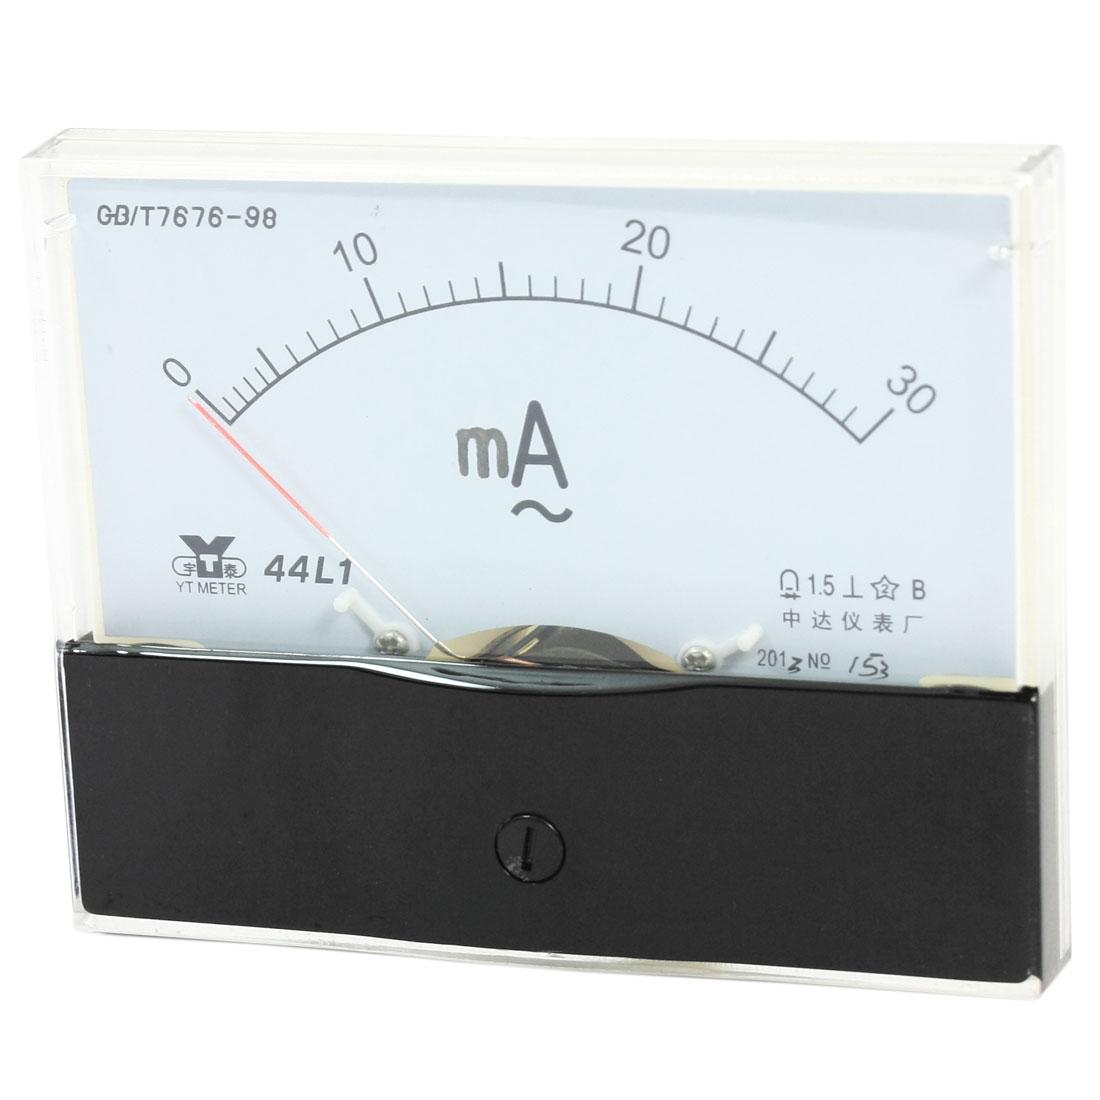 Measurement Tool Panel Mount Analog Ammeter Gauge AC 0 - 30mA Measuring Range 44L1